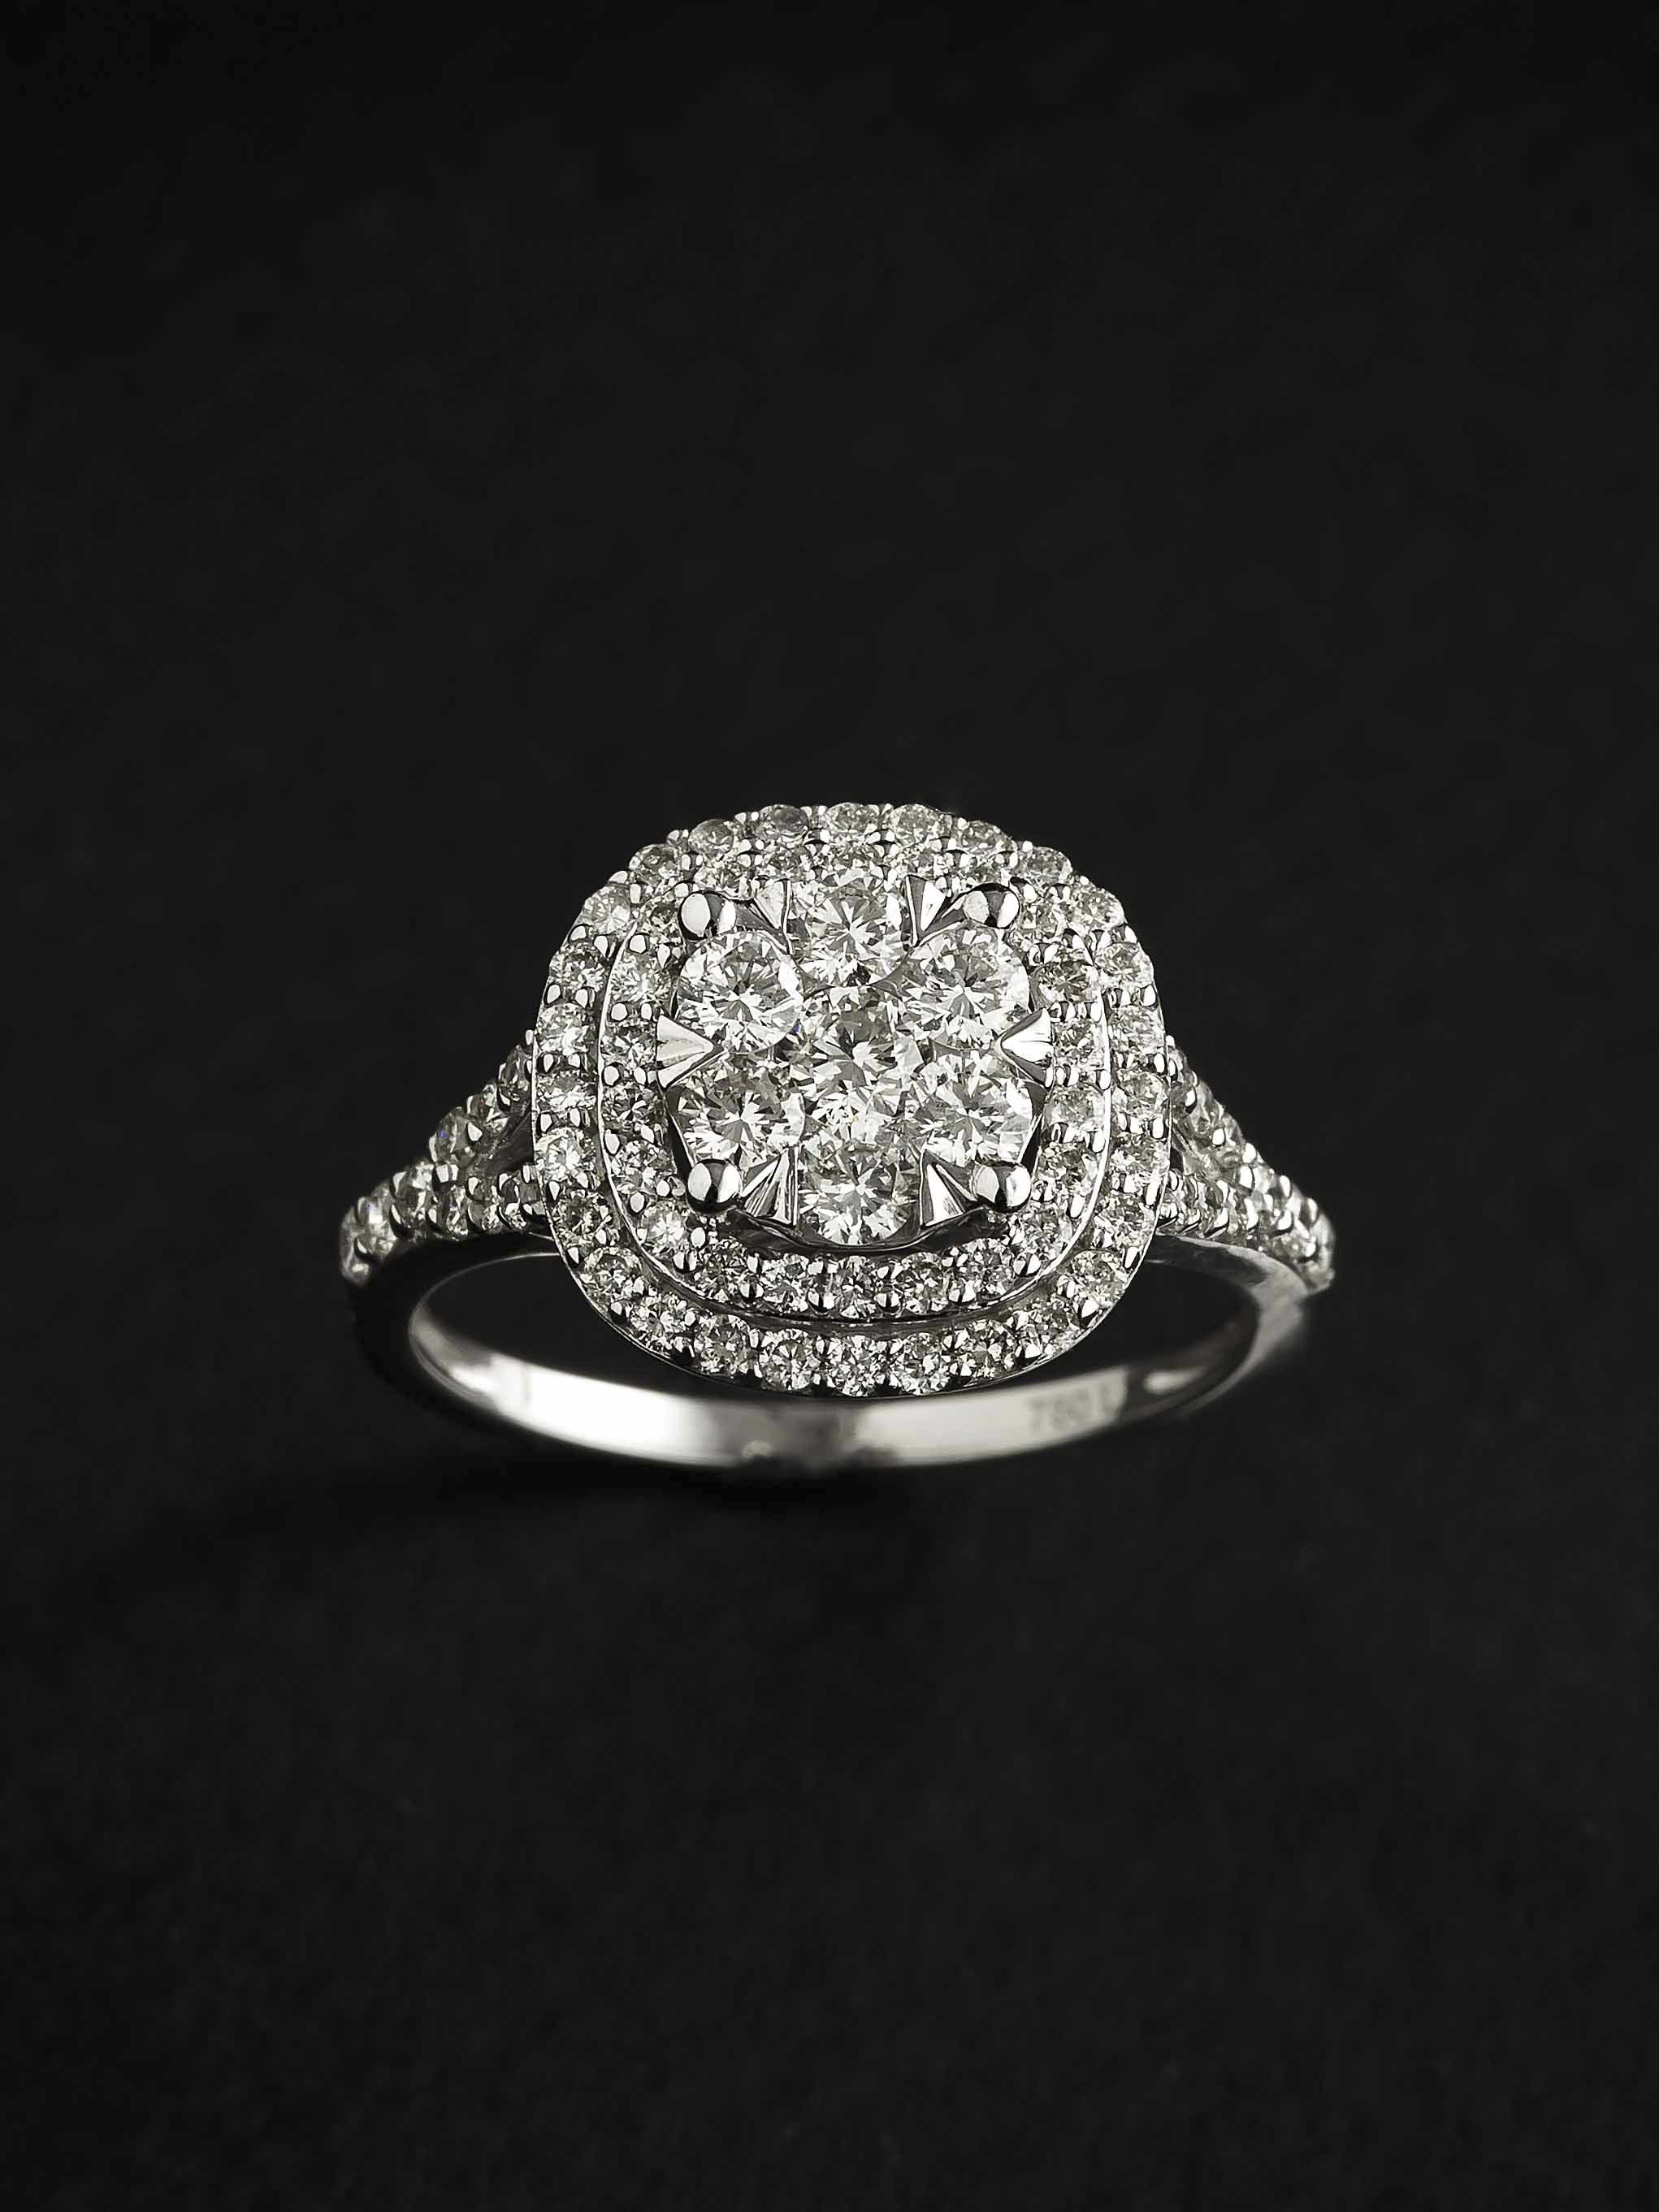 Sortija oro blanco diamantes One Carat Joyeria Jose Luis Joyero Malaga